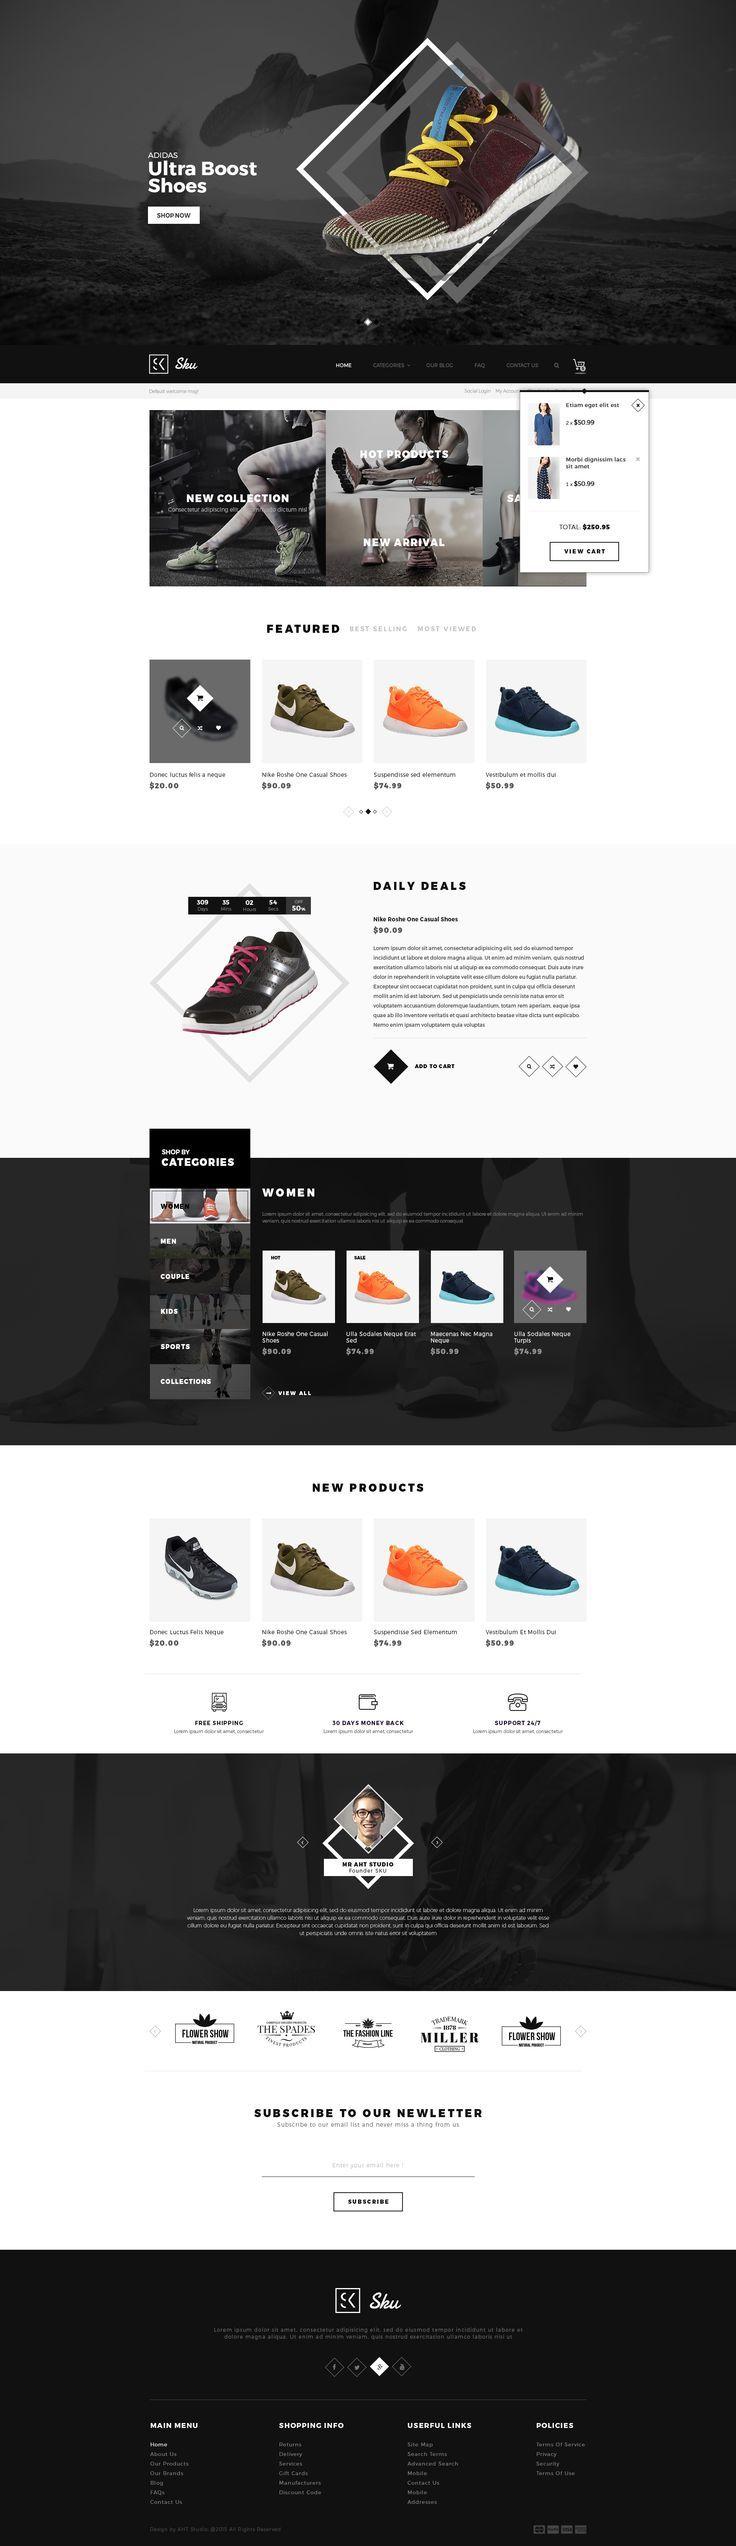 Top 5 Best Practices For Online Shopping Websites Web Design Tips Web Design Tips Ecommerce Website Design Magento Themes